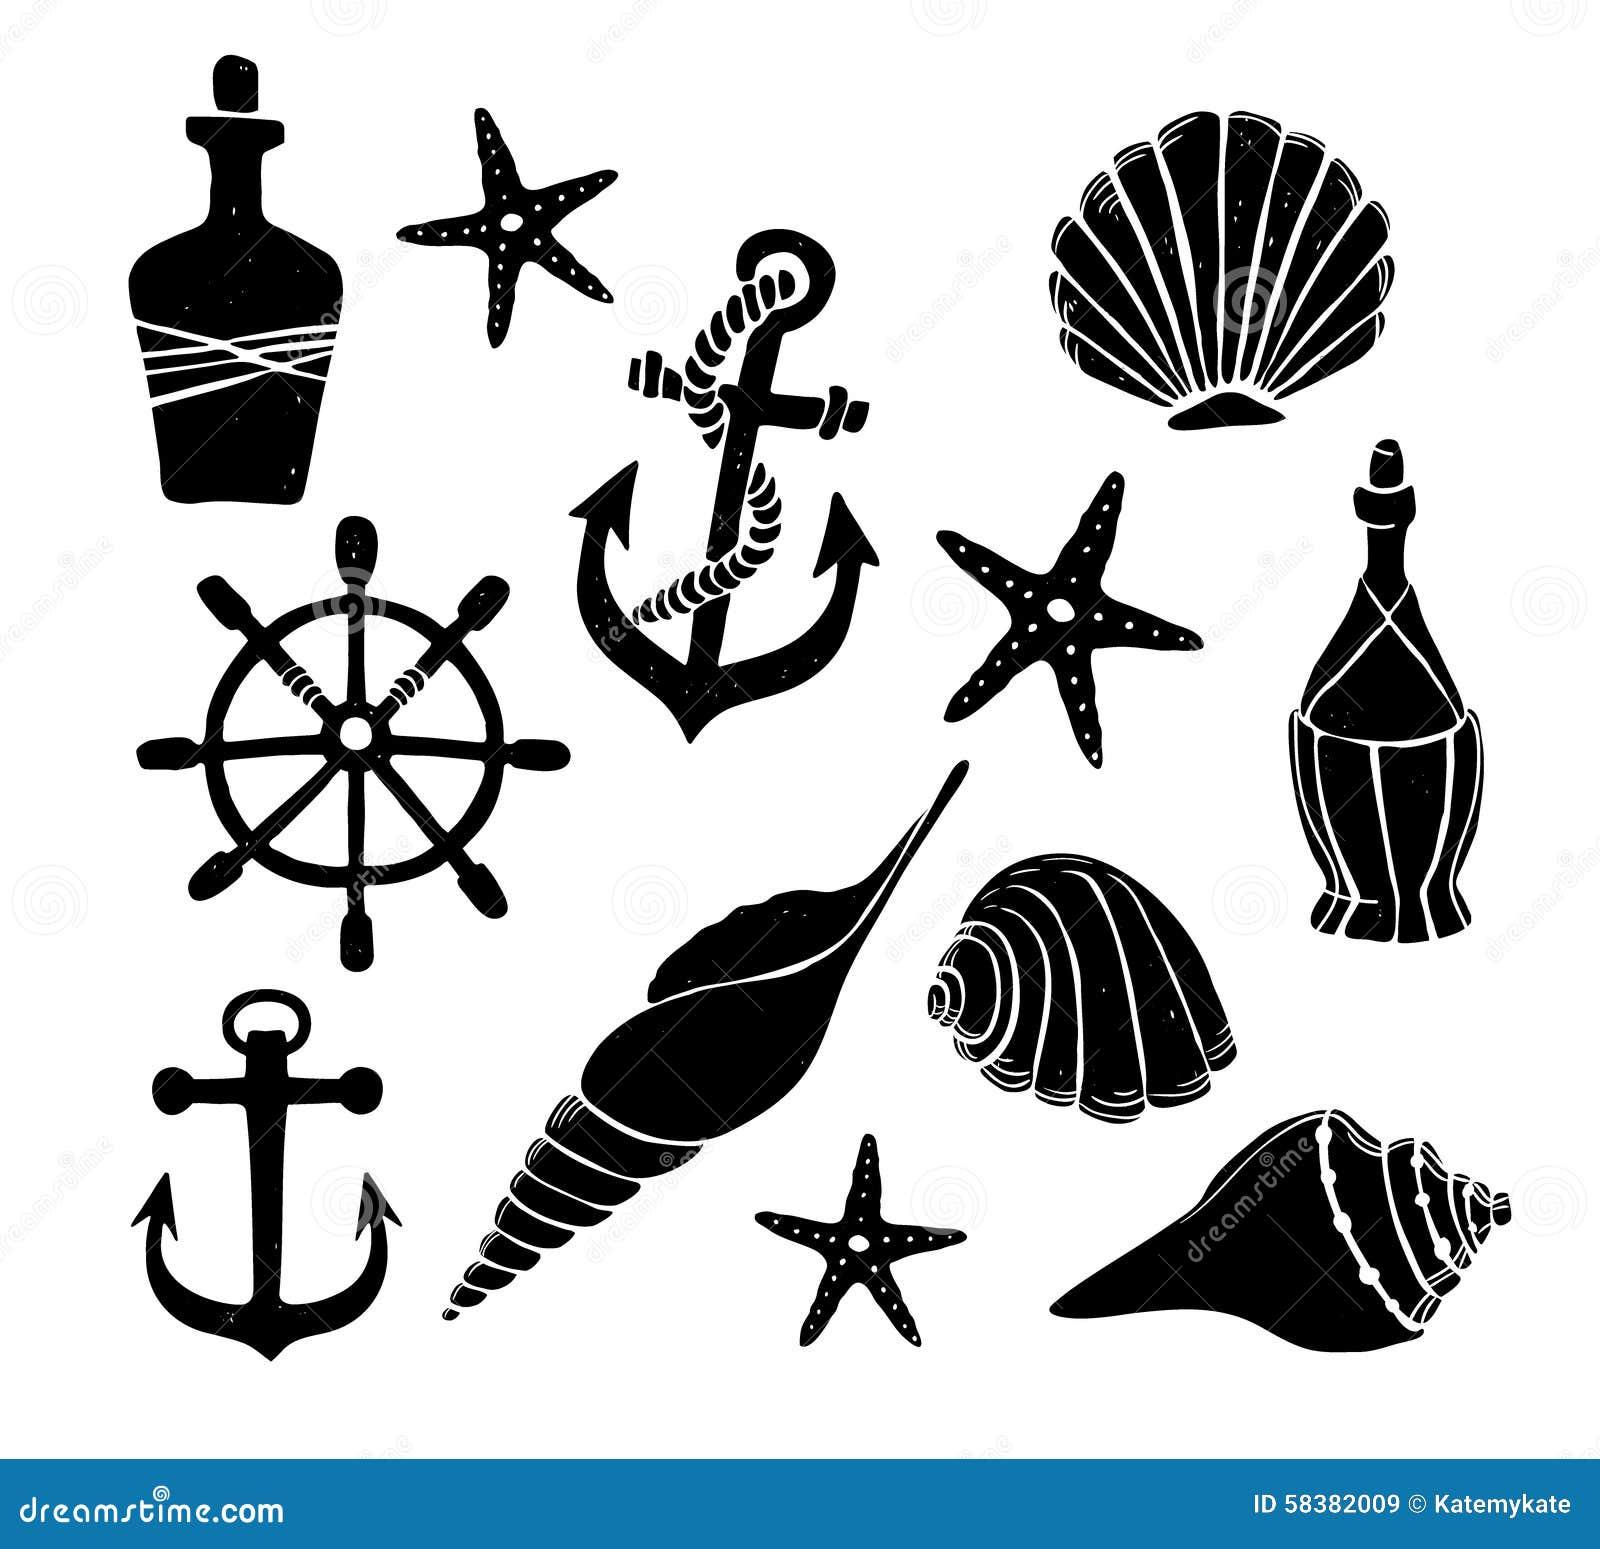 Elements For Design : Hand drawn vector illustration set of sea elements for